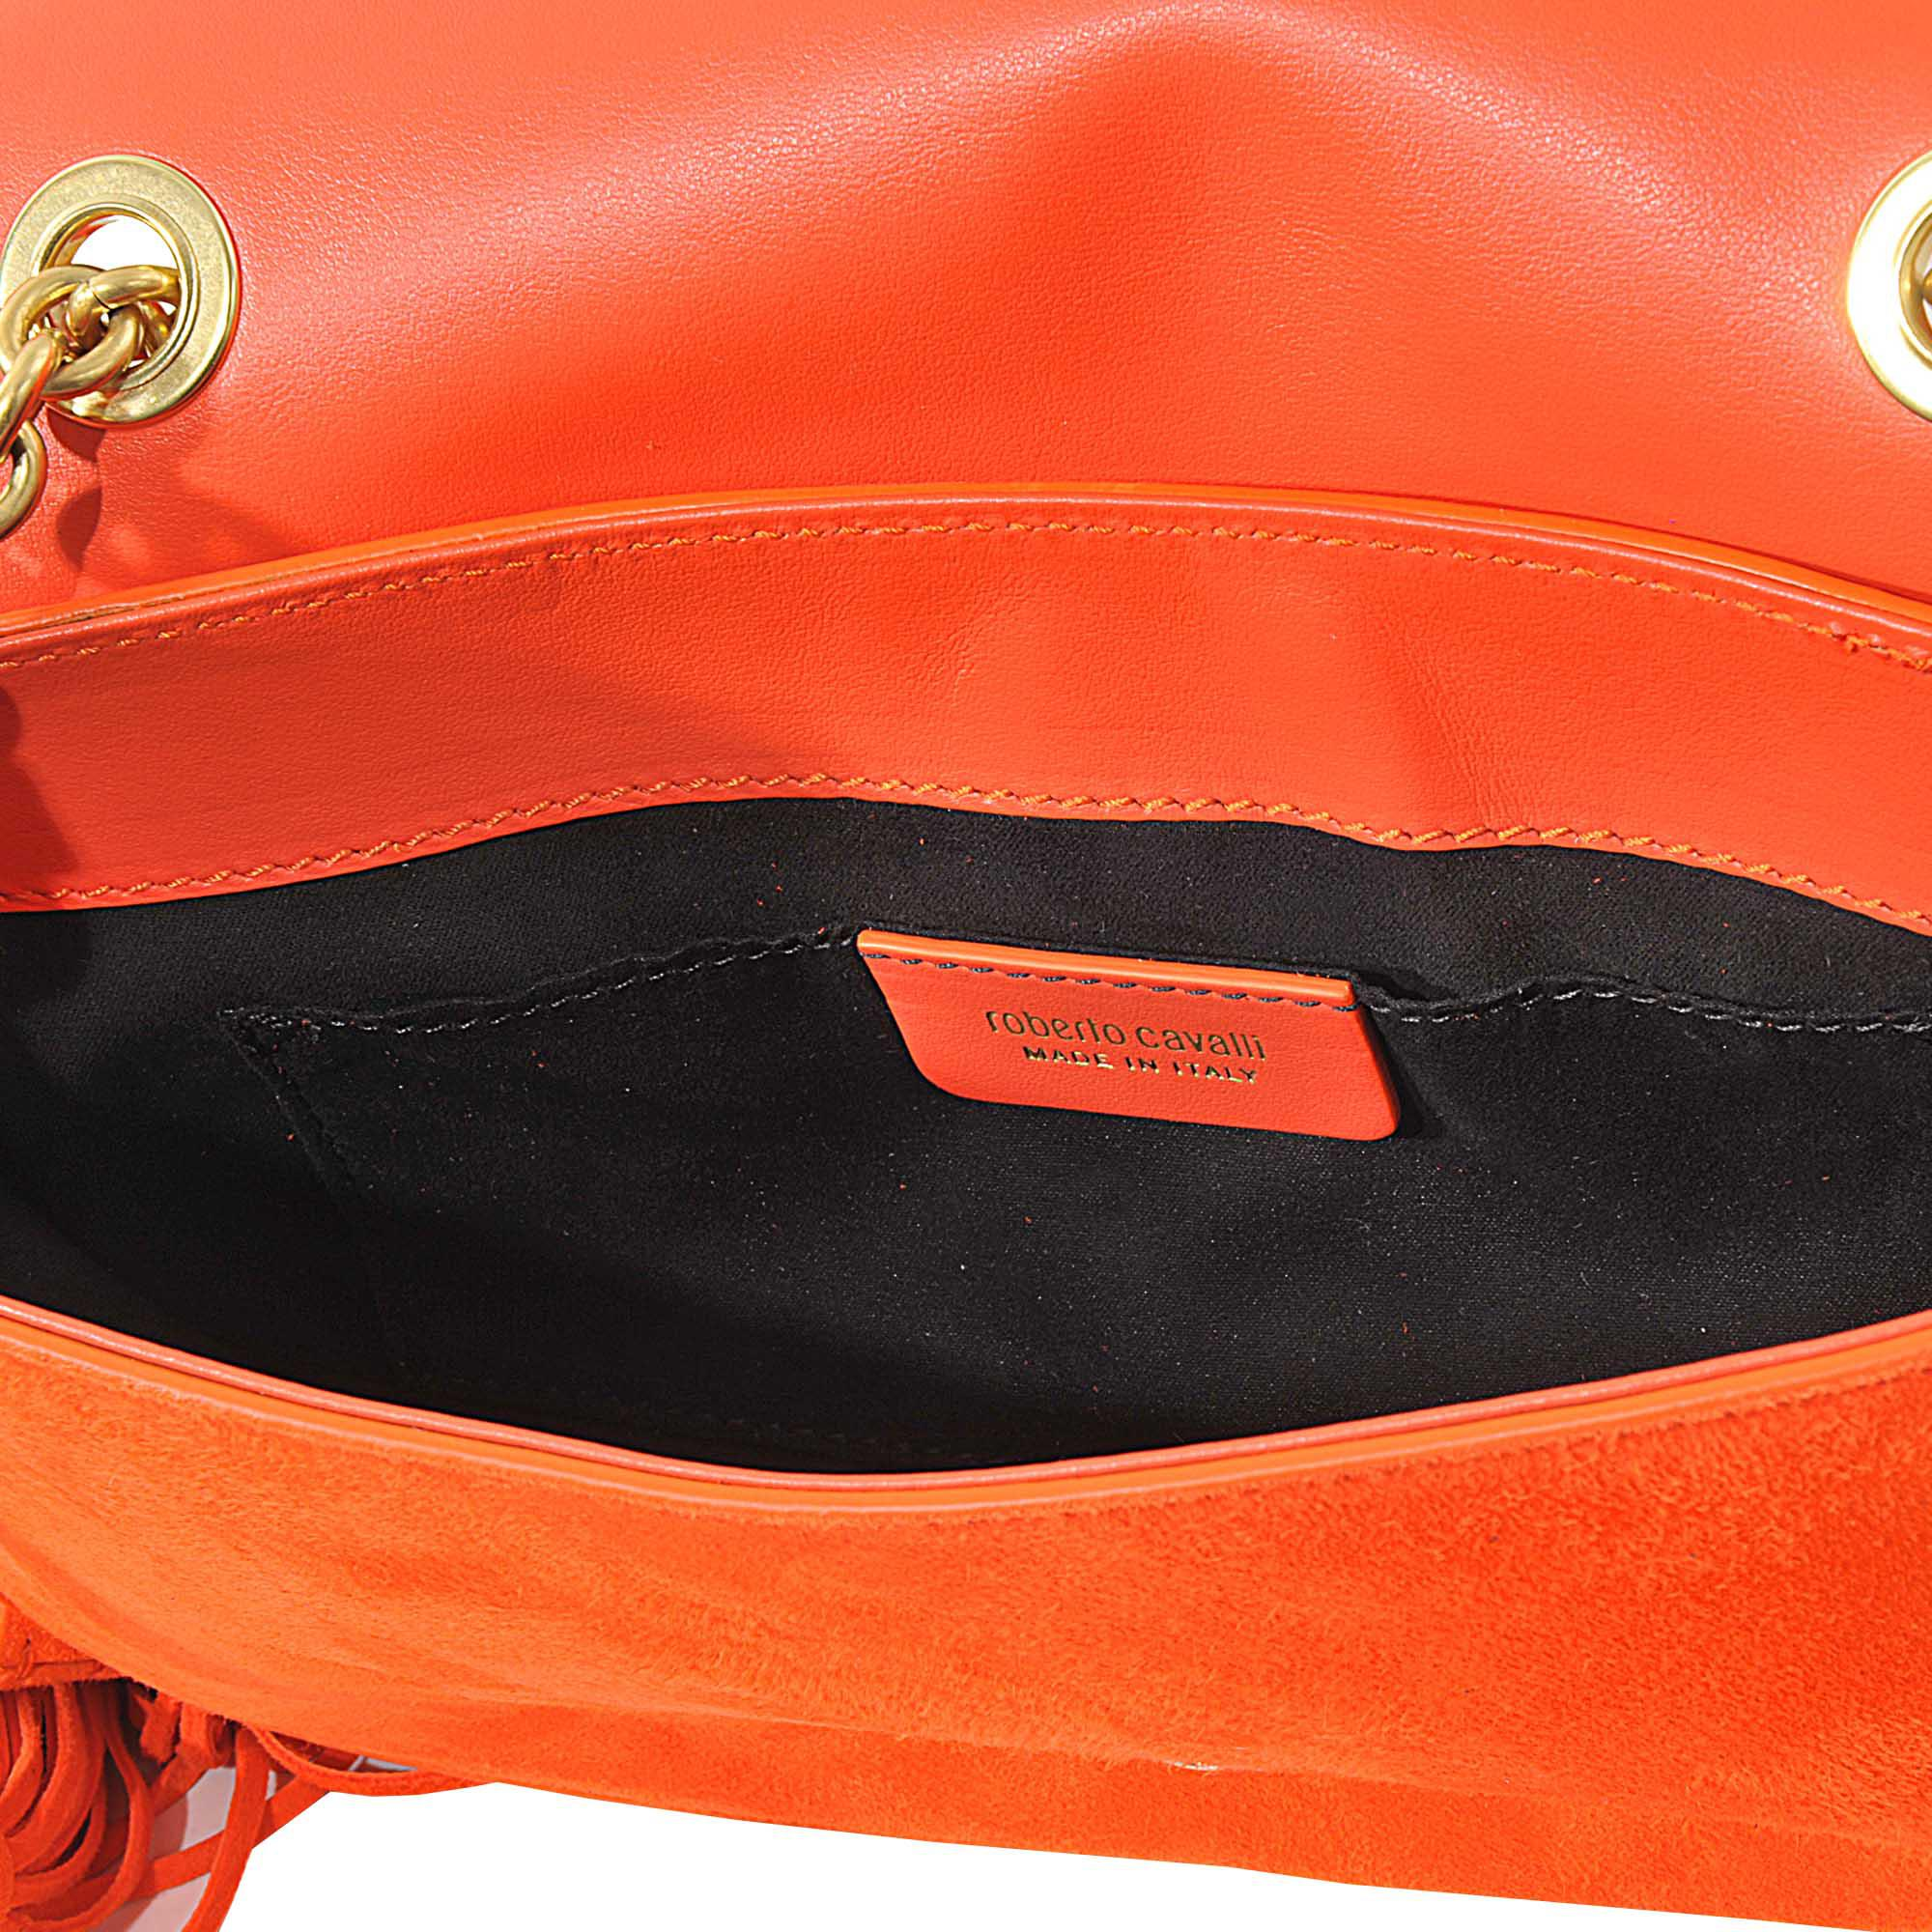 Flap Pompon bag Roberto Cavalli Zj2TQ8IIFF